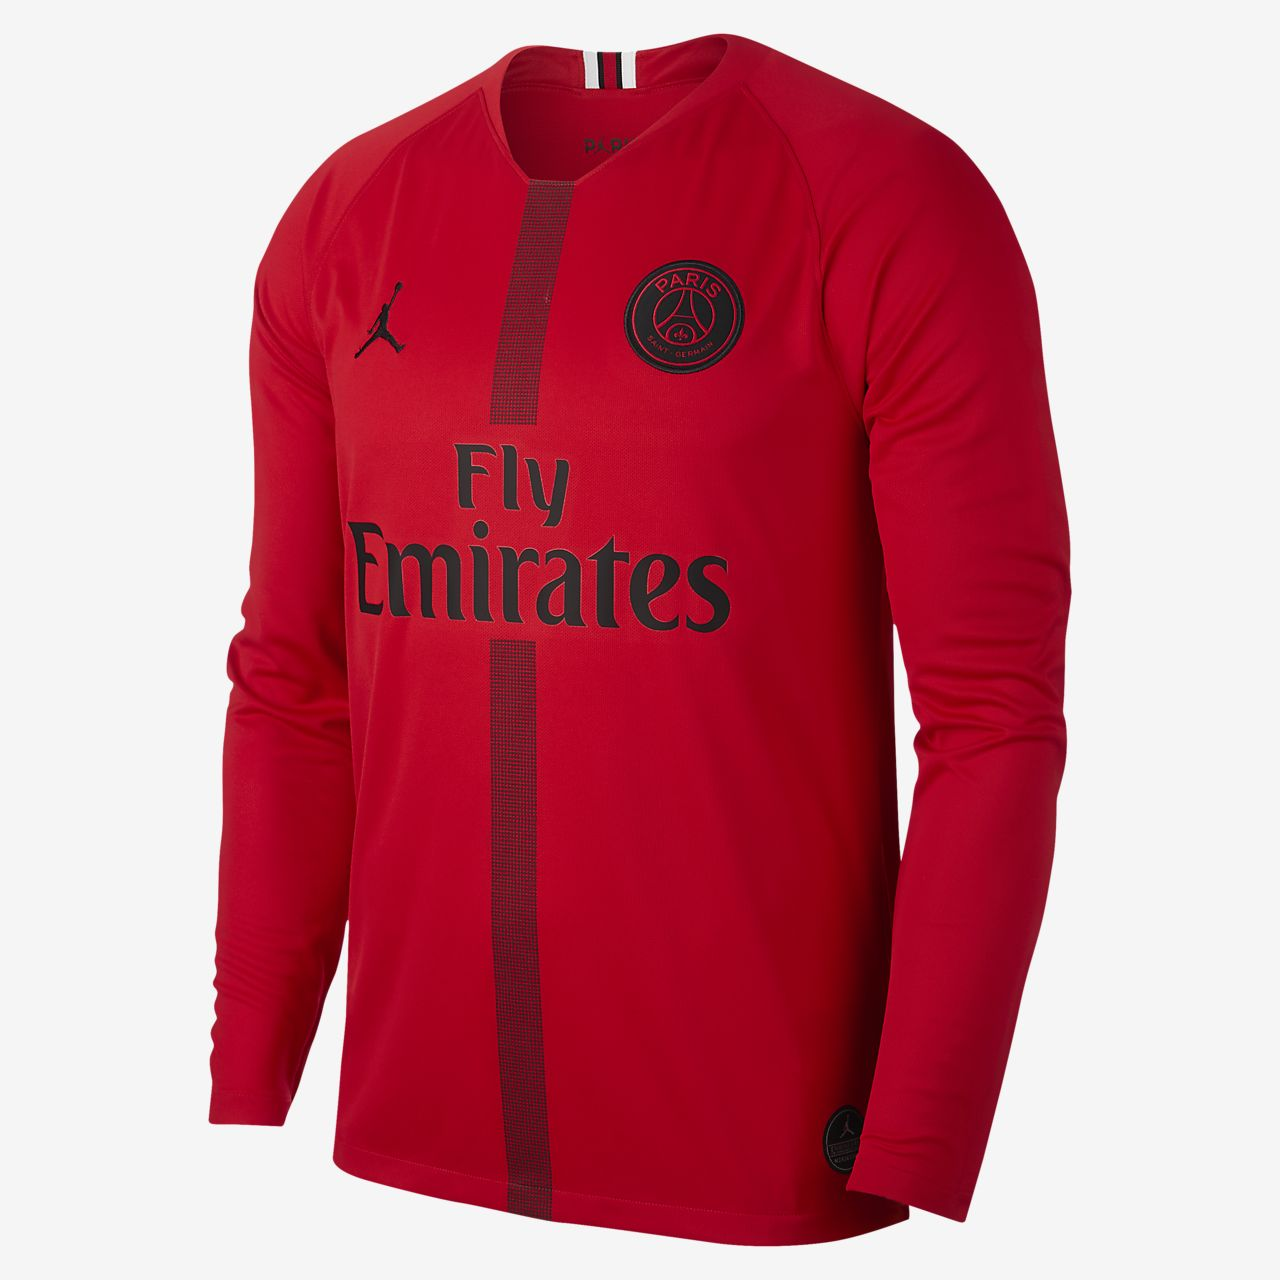 Saints Shirt 201819 ✓ Labzada T Shirt. Saints Shirt 201819 ✓. Jersey 2018  19 Psg. ... 586b83989